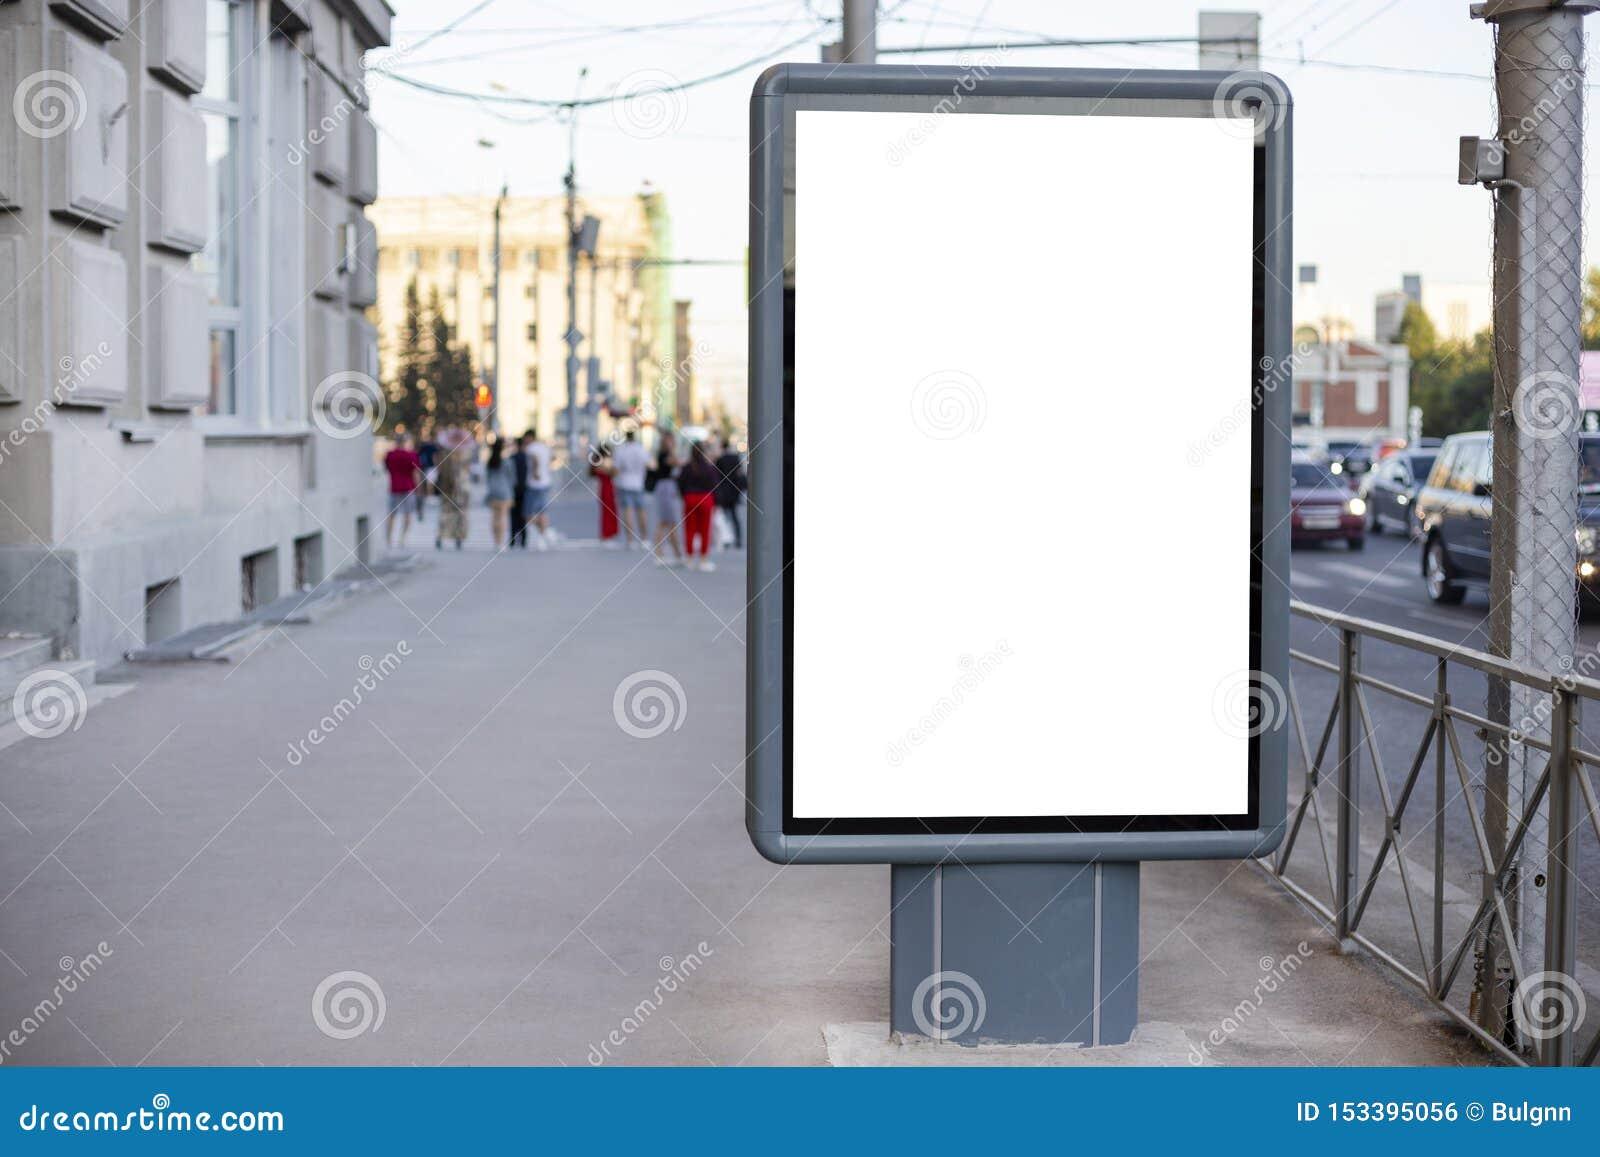 Vertical Blank Billboard  Mockup Of Outdoor Advertising With